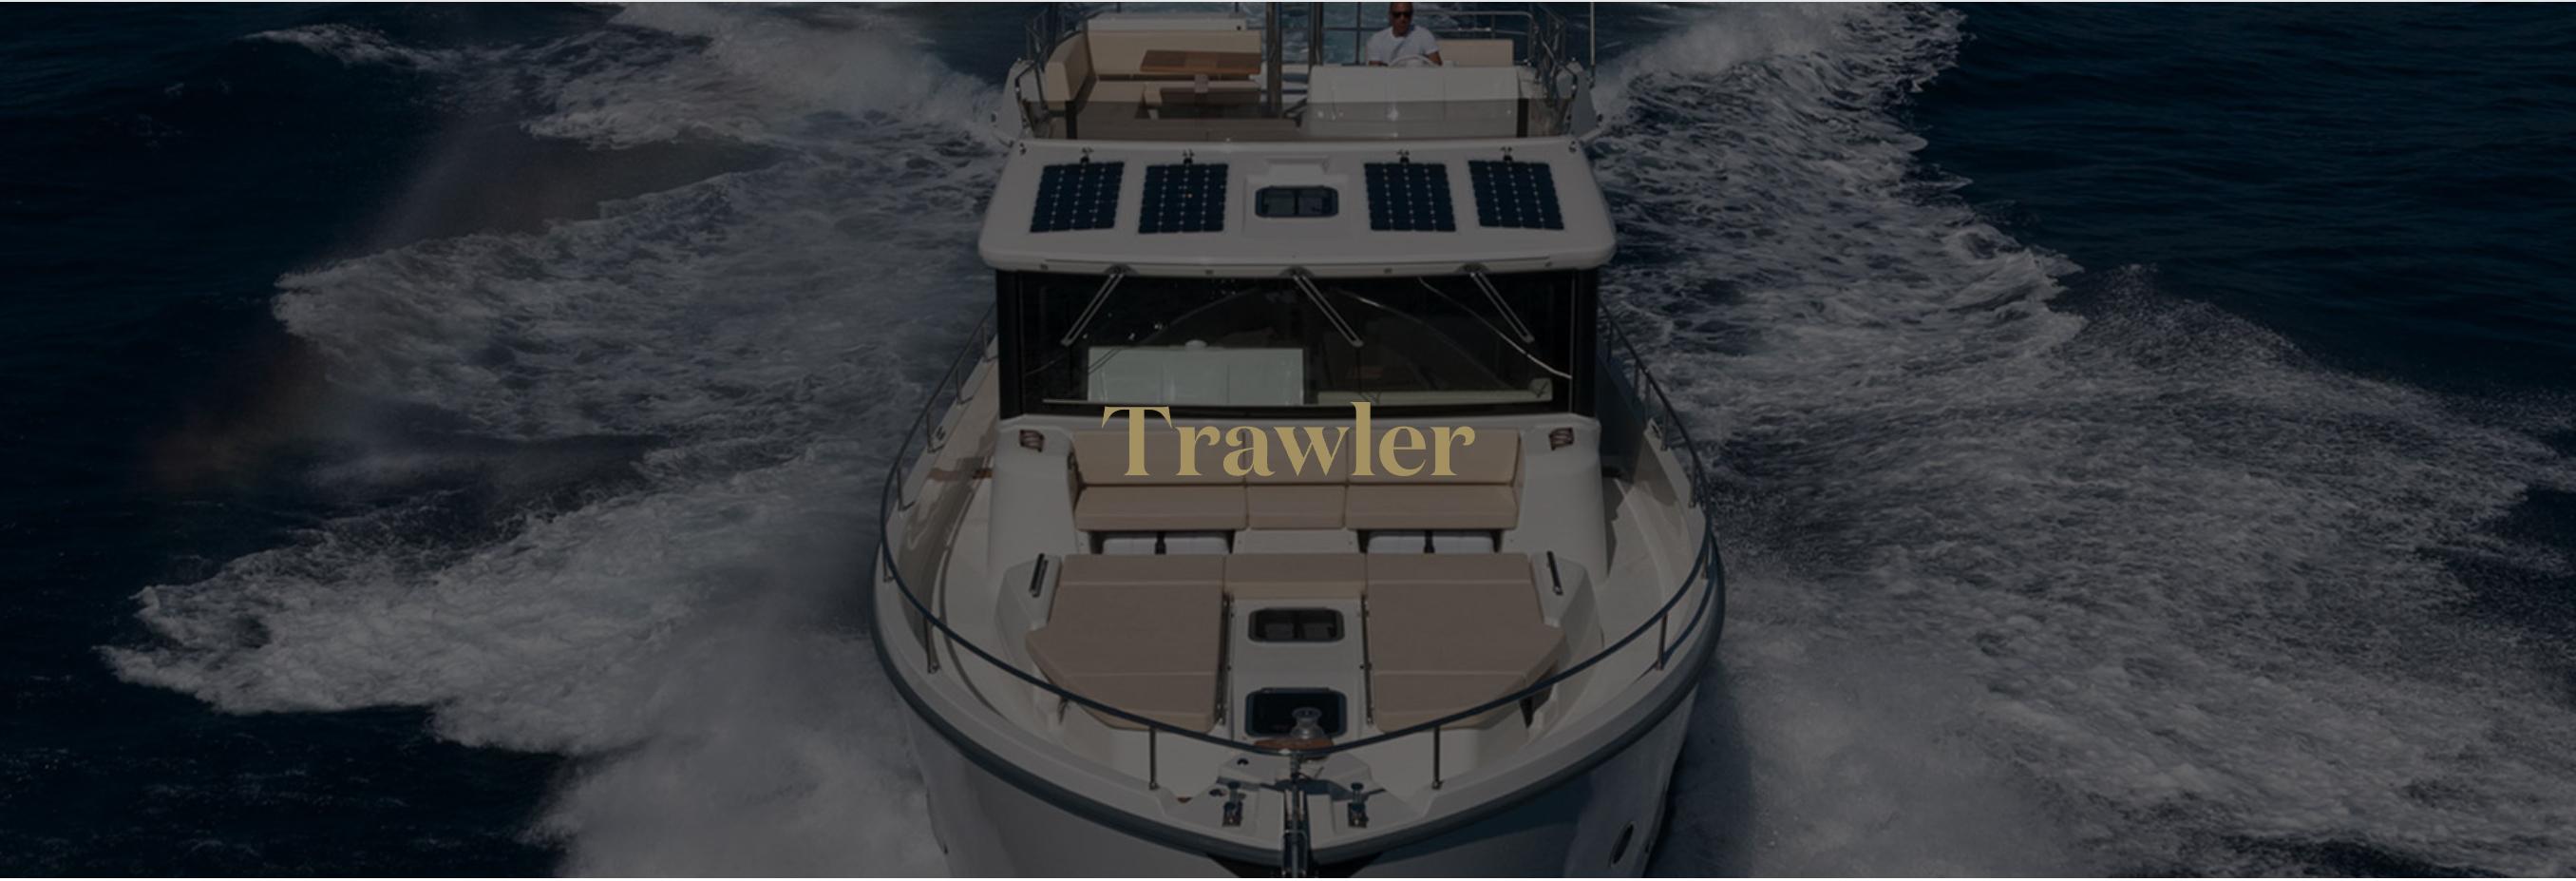 ^trawler spalte